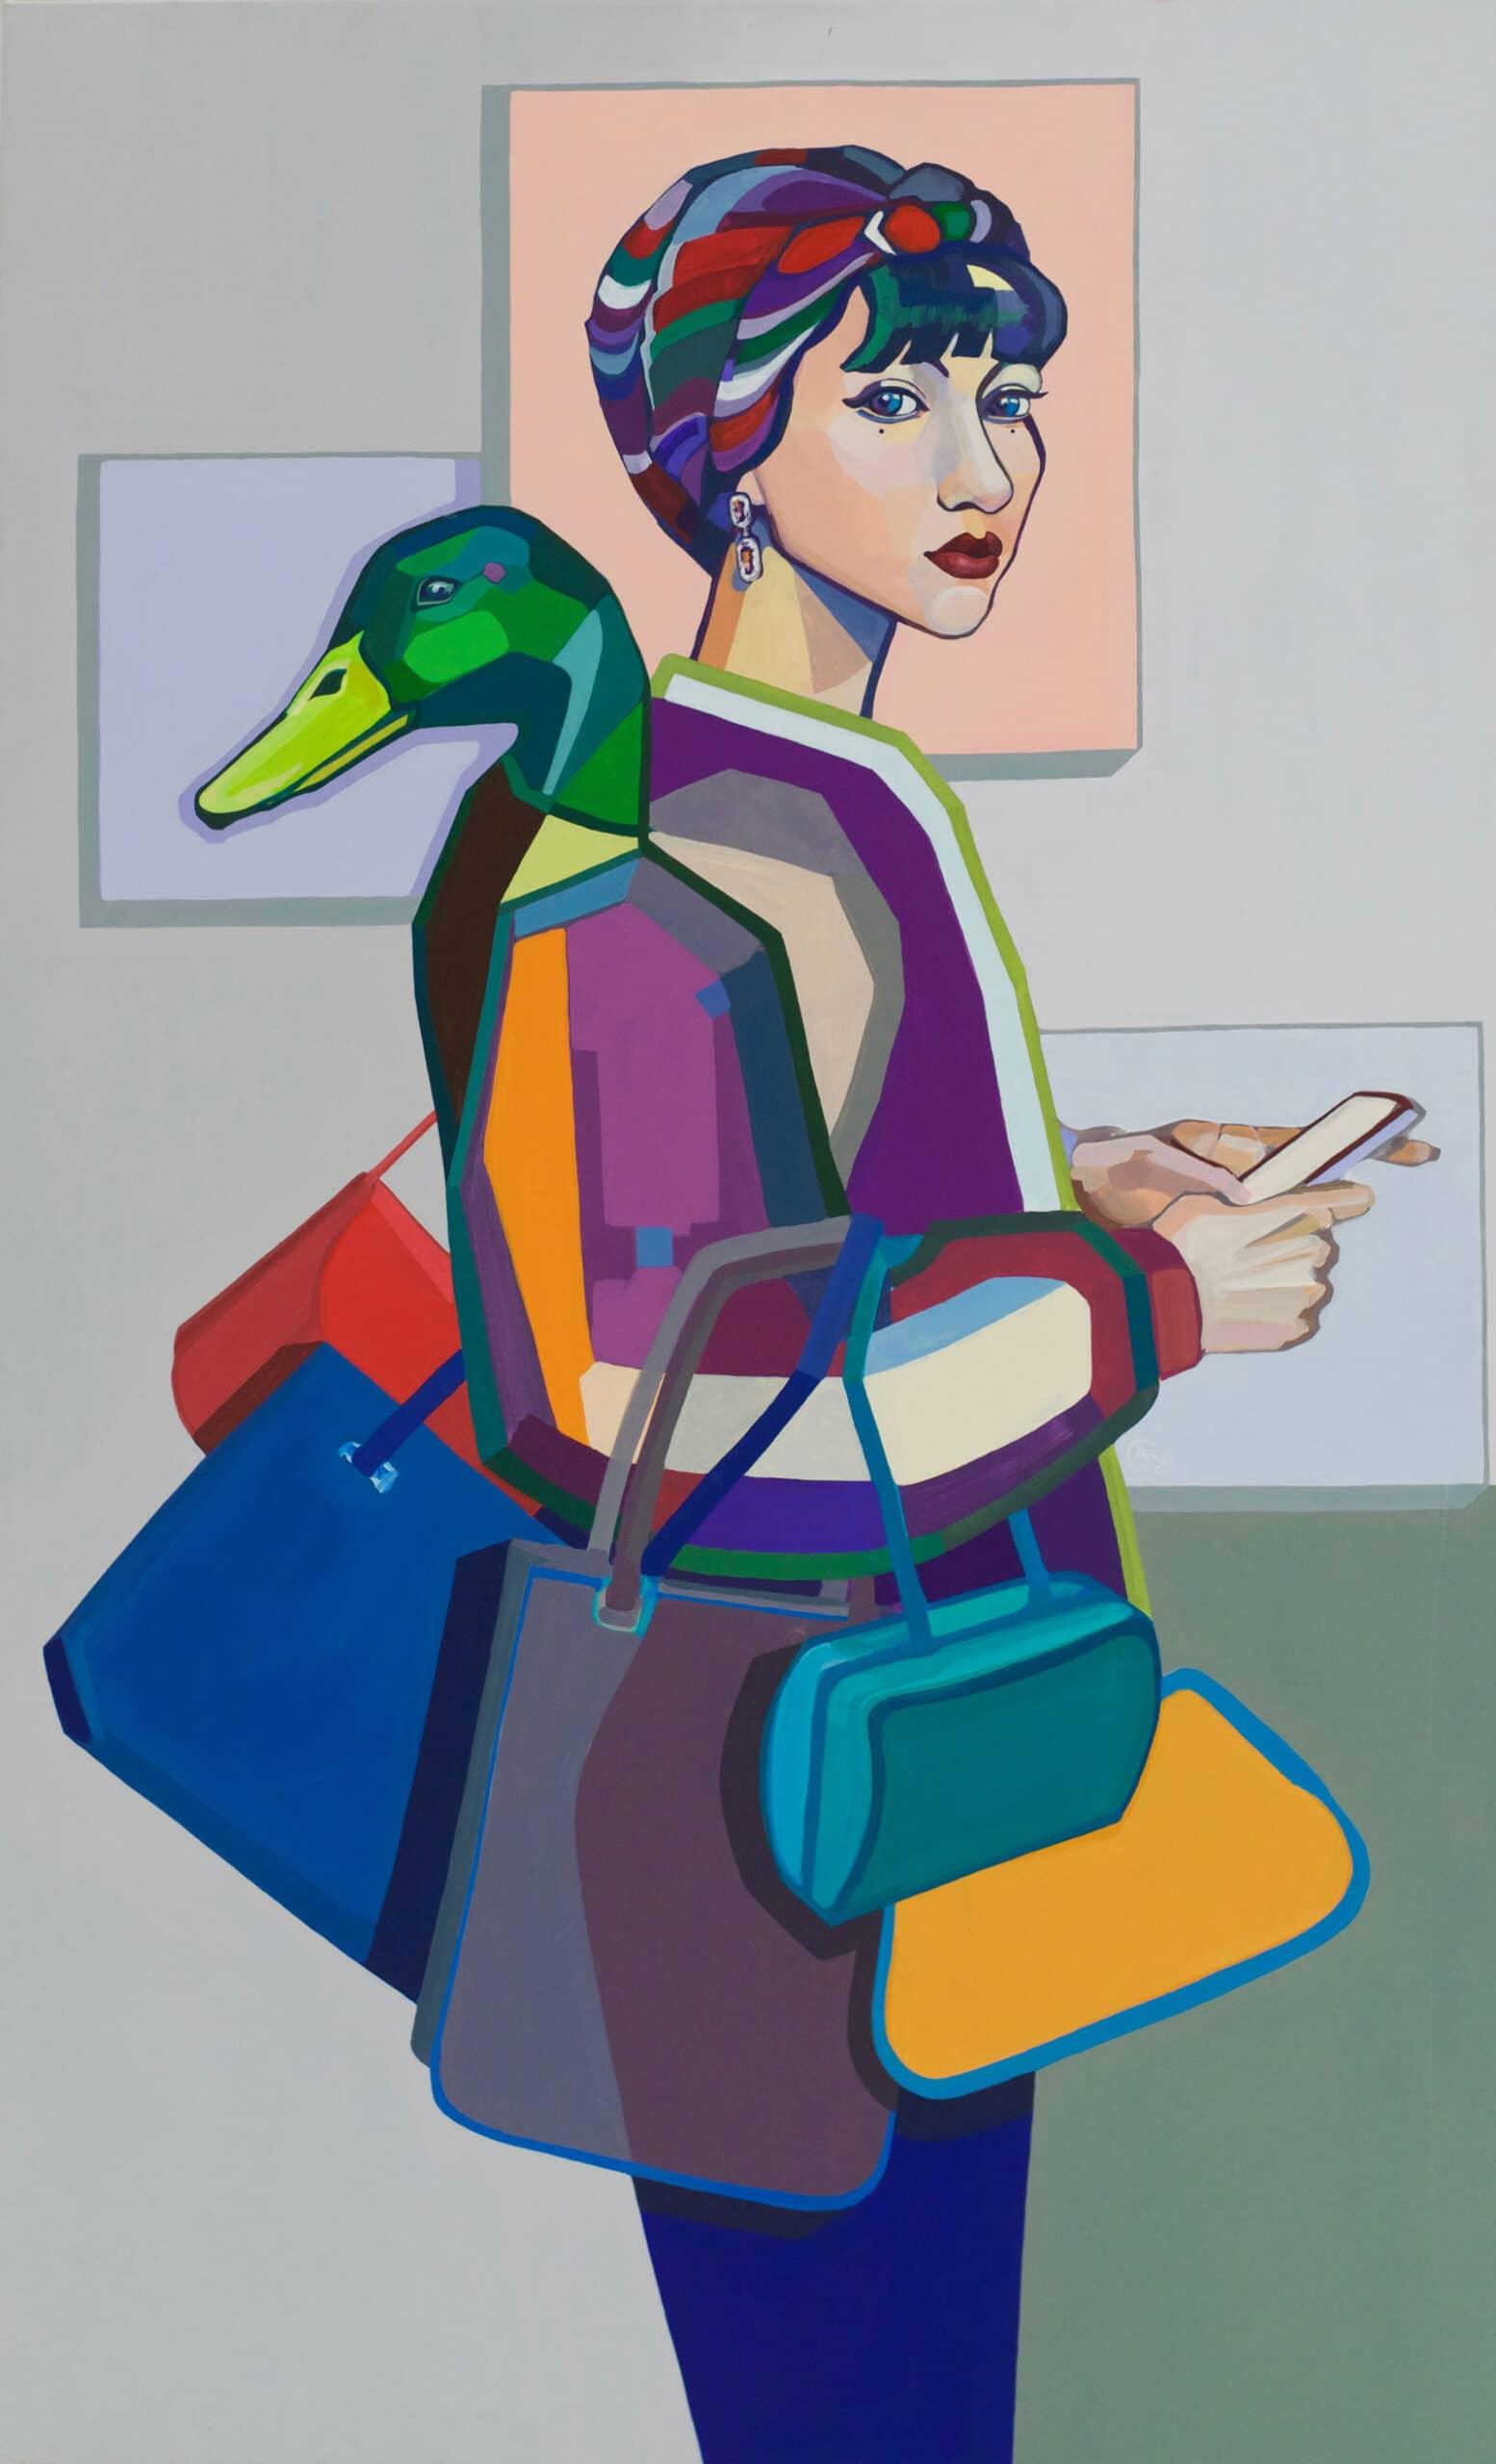 Modern acrylic painting 'Fashionista'. Artist Agne Kisonaite